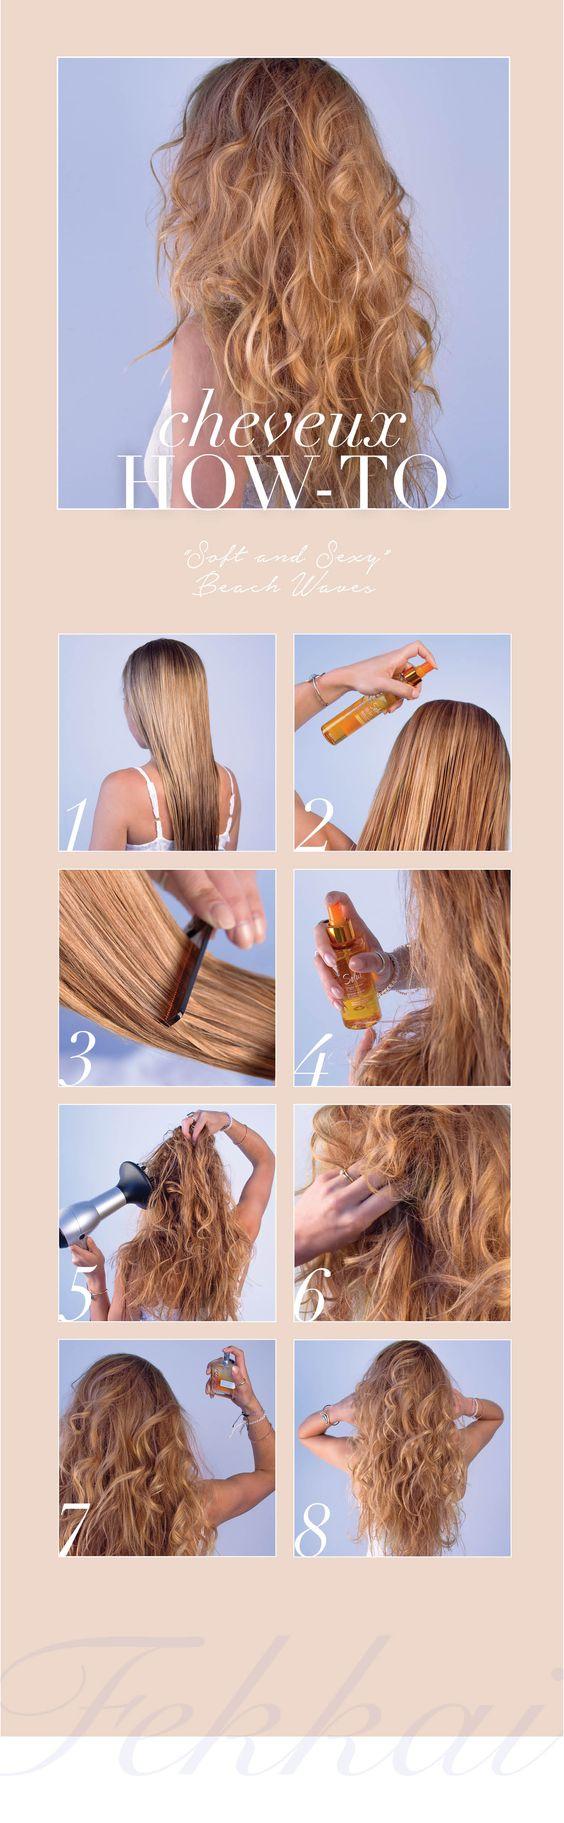 The Perfect Summer Beach Waves Hair How-to: 1. Start with clean, damp hair 2. Spray Pre-Soleil Hair Mist throughout hair for SPF protection 3. Comb through 4. Spray Fekkai Beach Waves Tousling Spray onto hair, while scrunching hair from the bottom up.  5. Use a diffuser or let hair air dry 6. Tousle and shape waves as needed 7. Finish off look with Fekkai L'air de St. Barths Hair Fragrance. 8. Voila! The perfect Femme Fekkai beachy waves